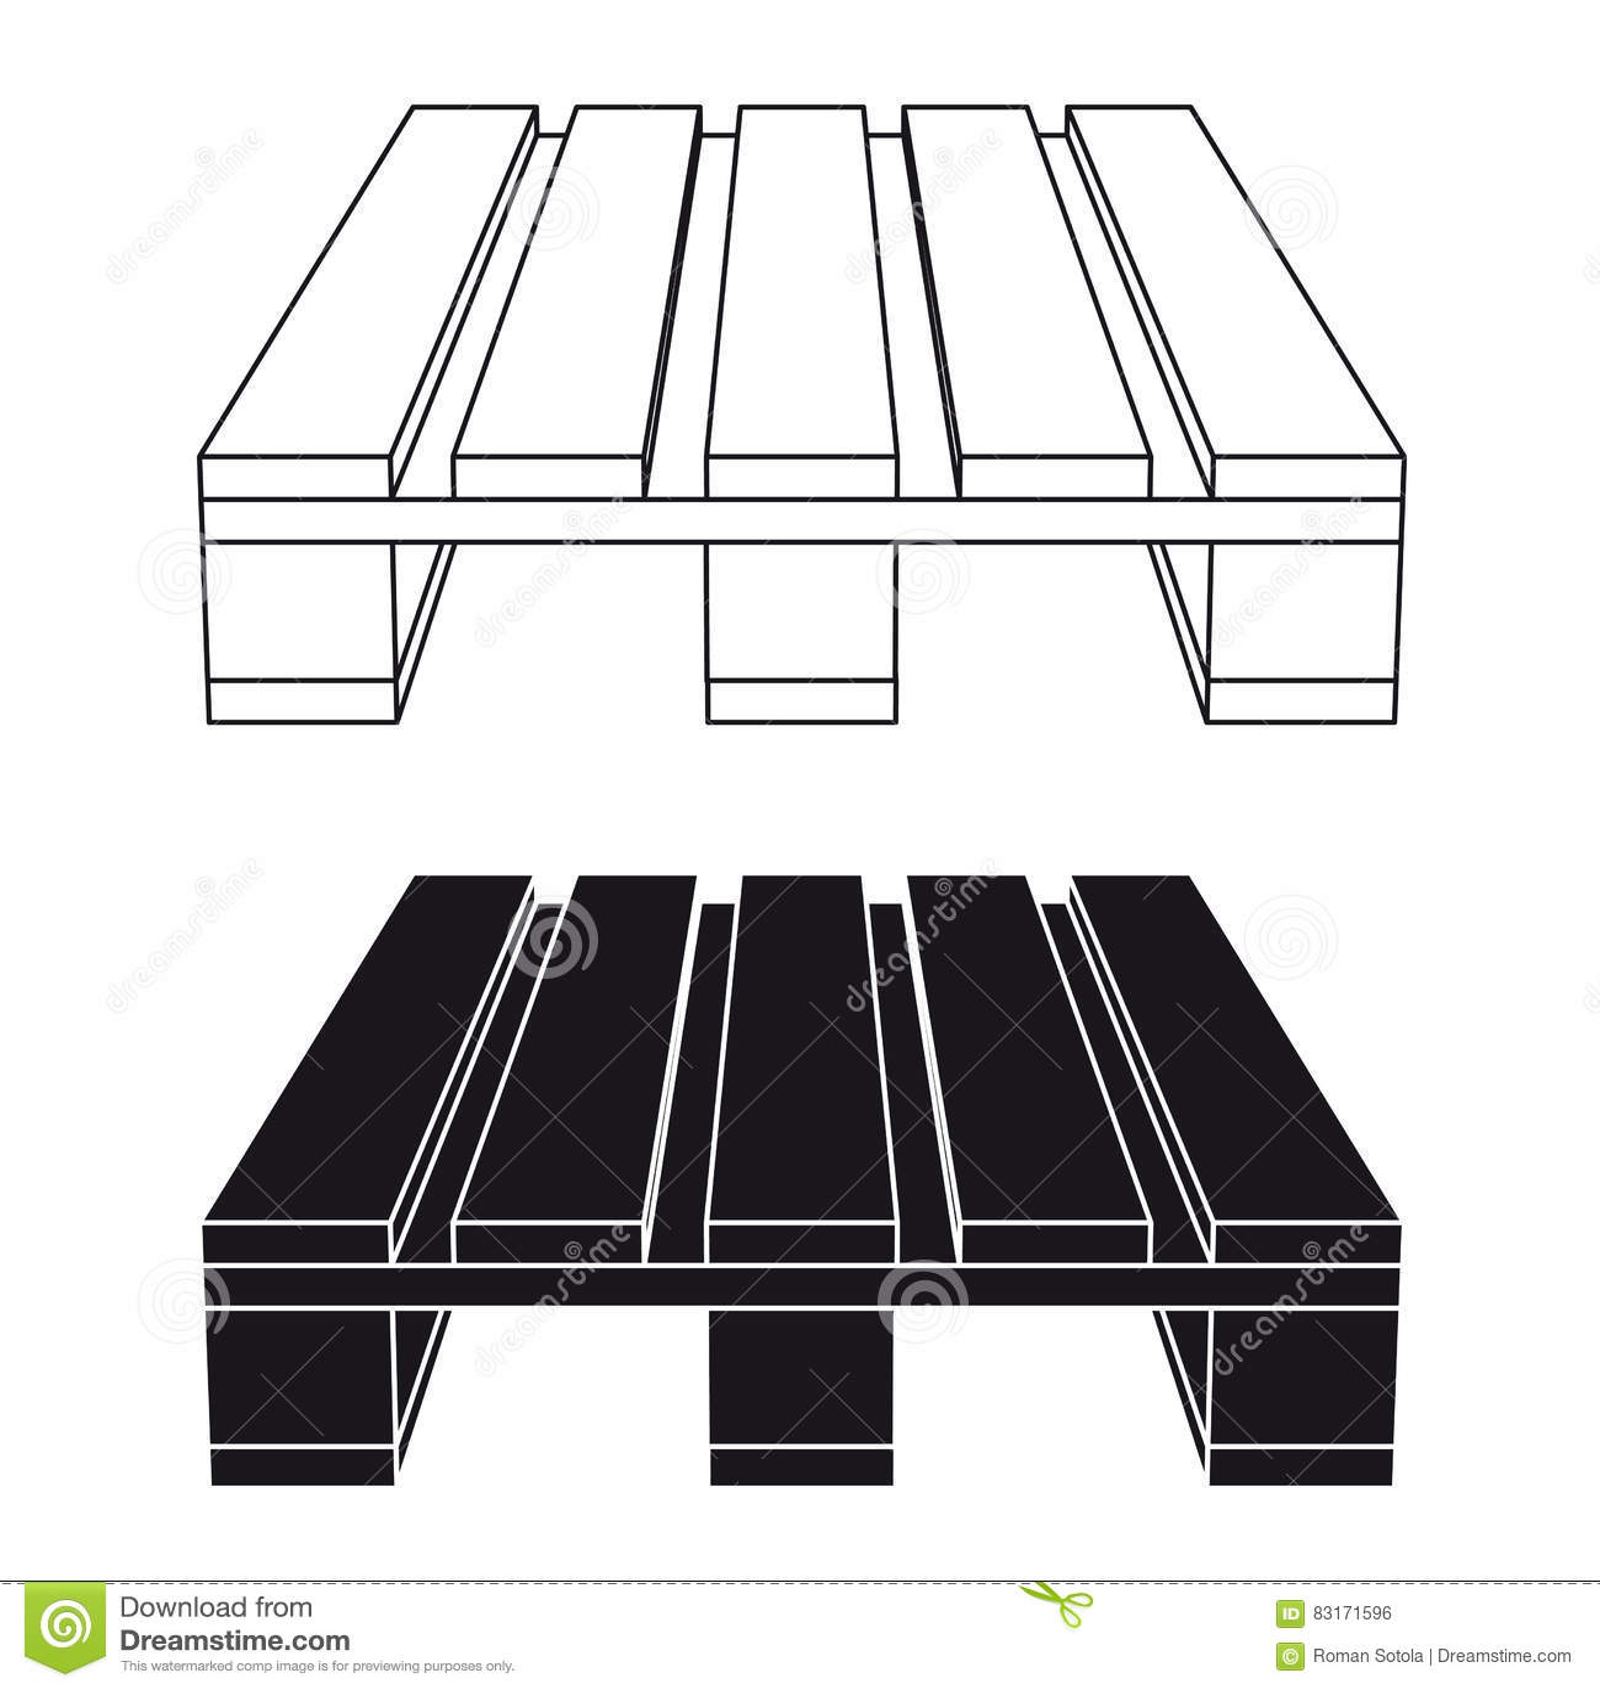 Wooden pallet black symbol stock vector illustration of crate wooden pallet black symbol biocorpaavc